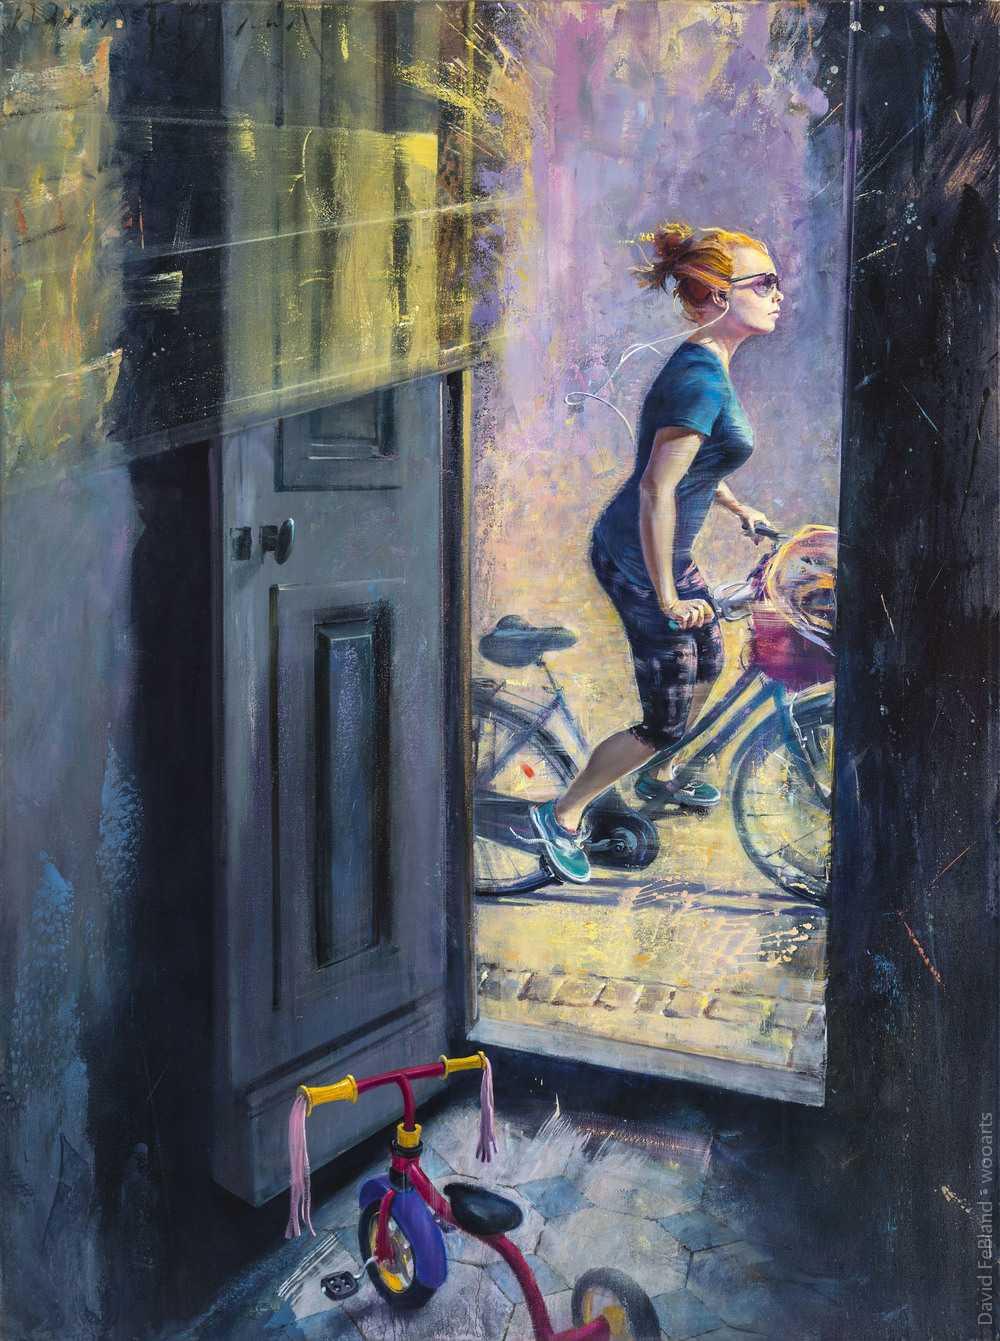 David FeBland Painting